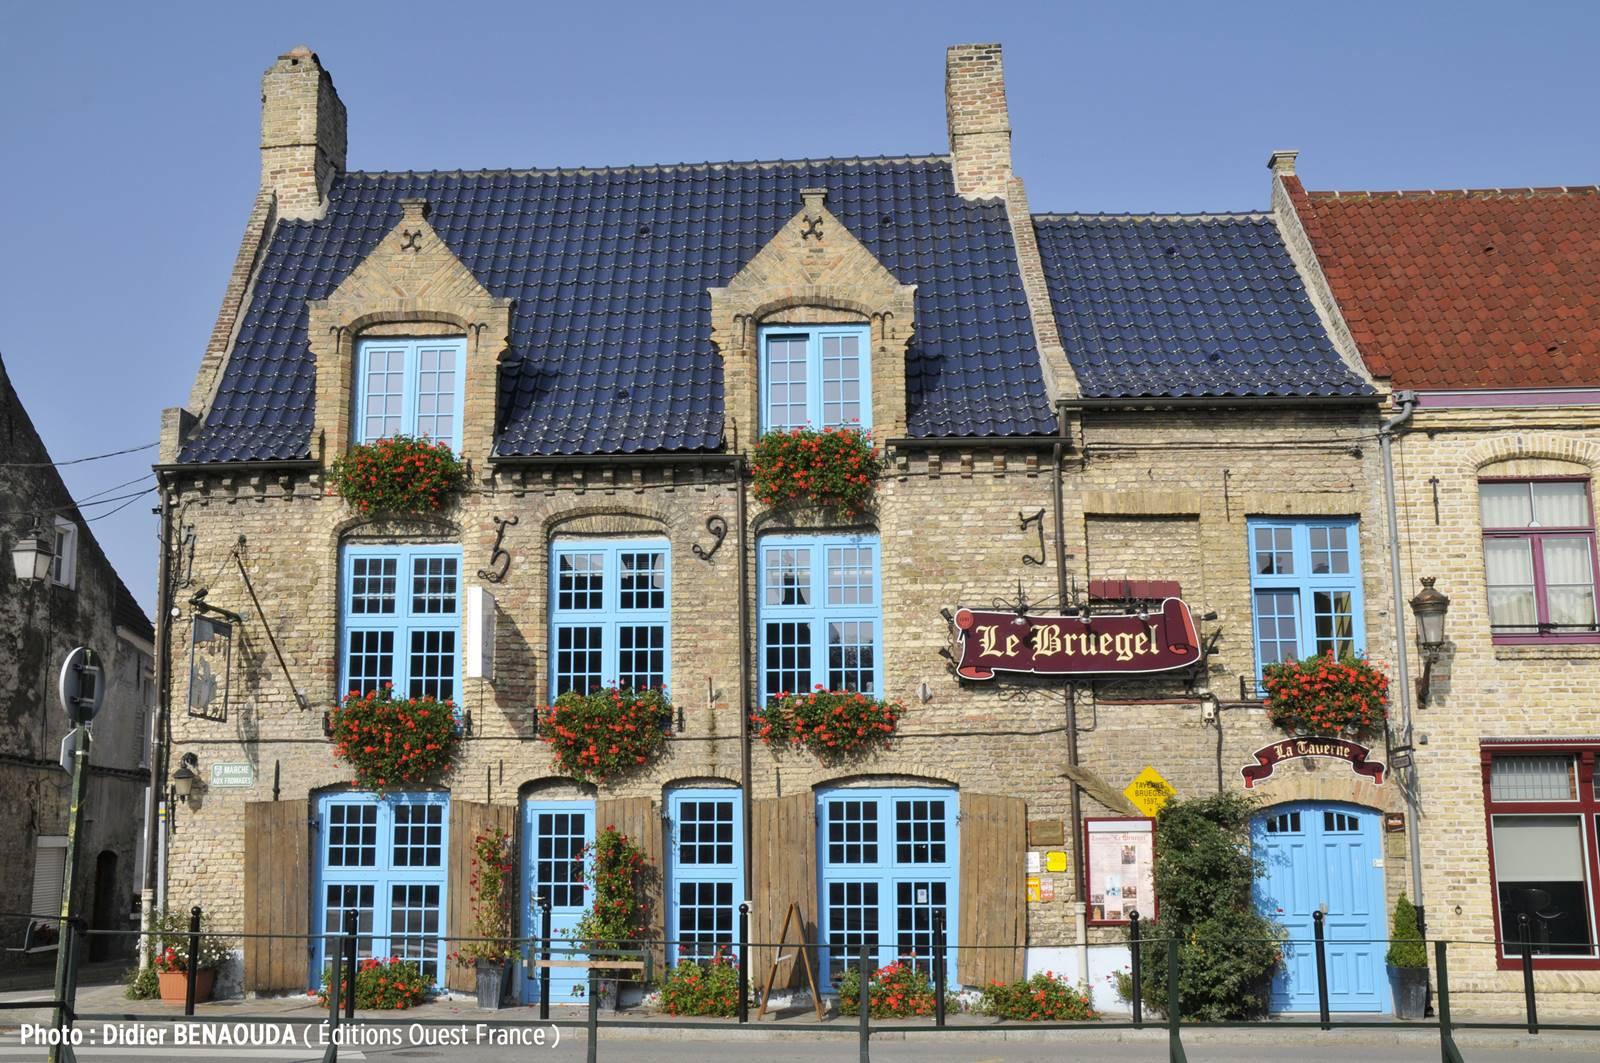 restaurant-bruegel-bergues (2).jpg